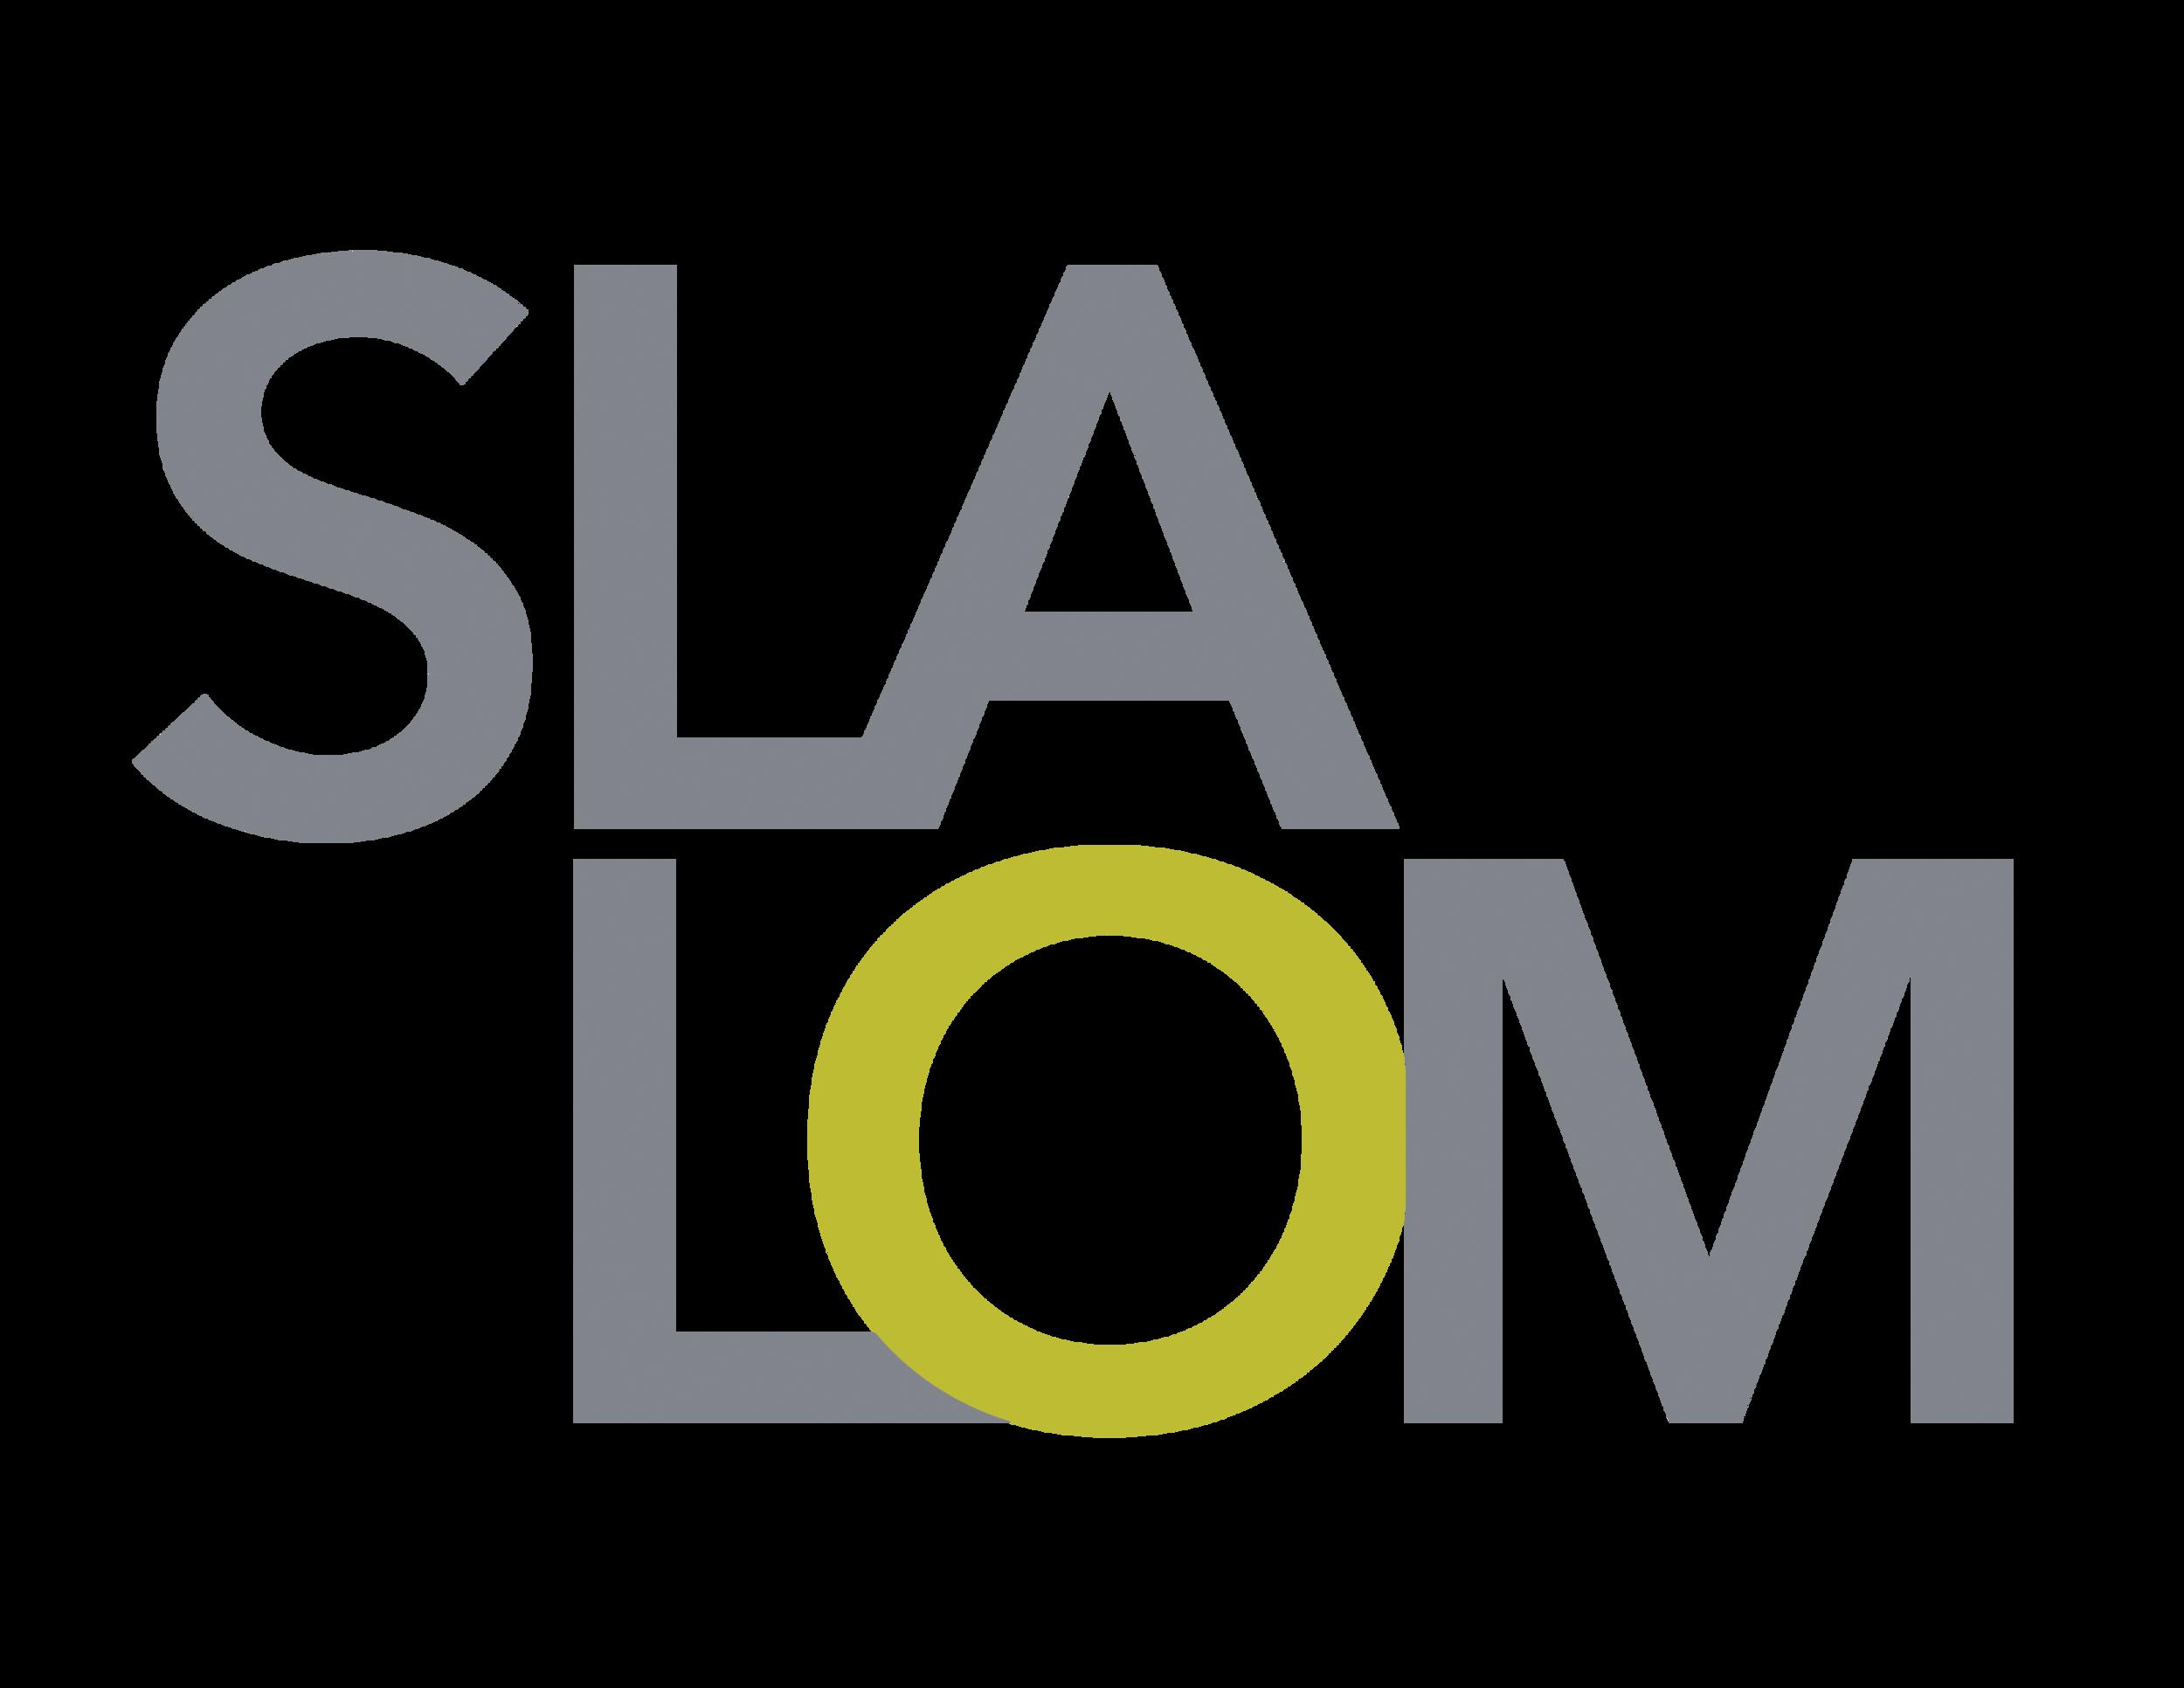 SLALOM_logo.png